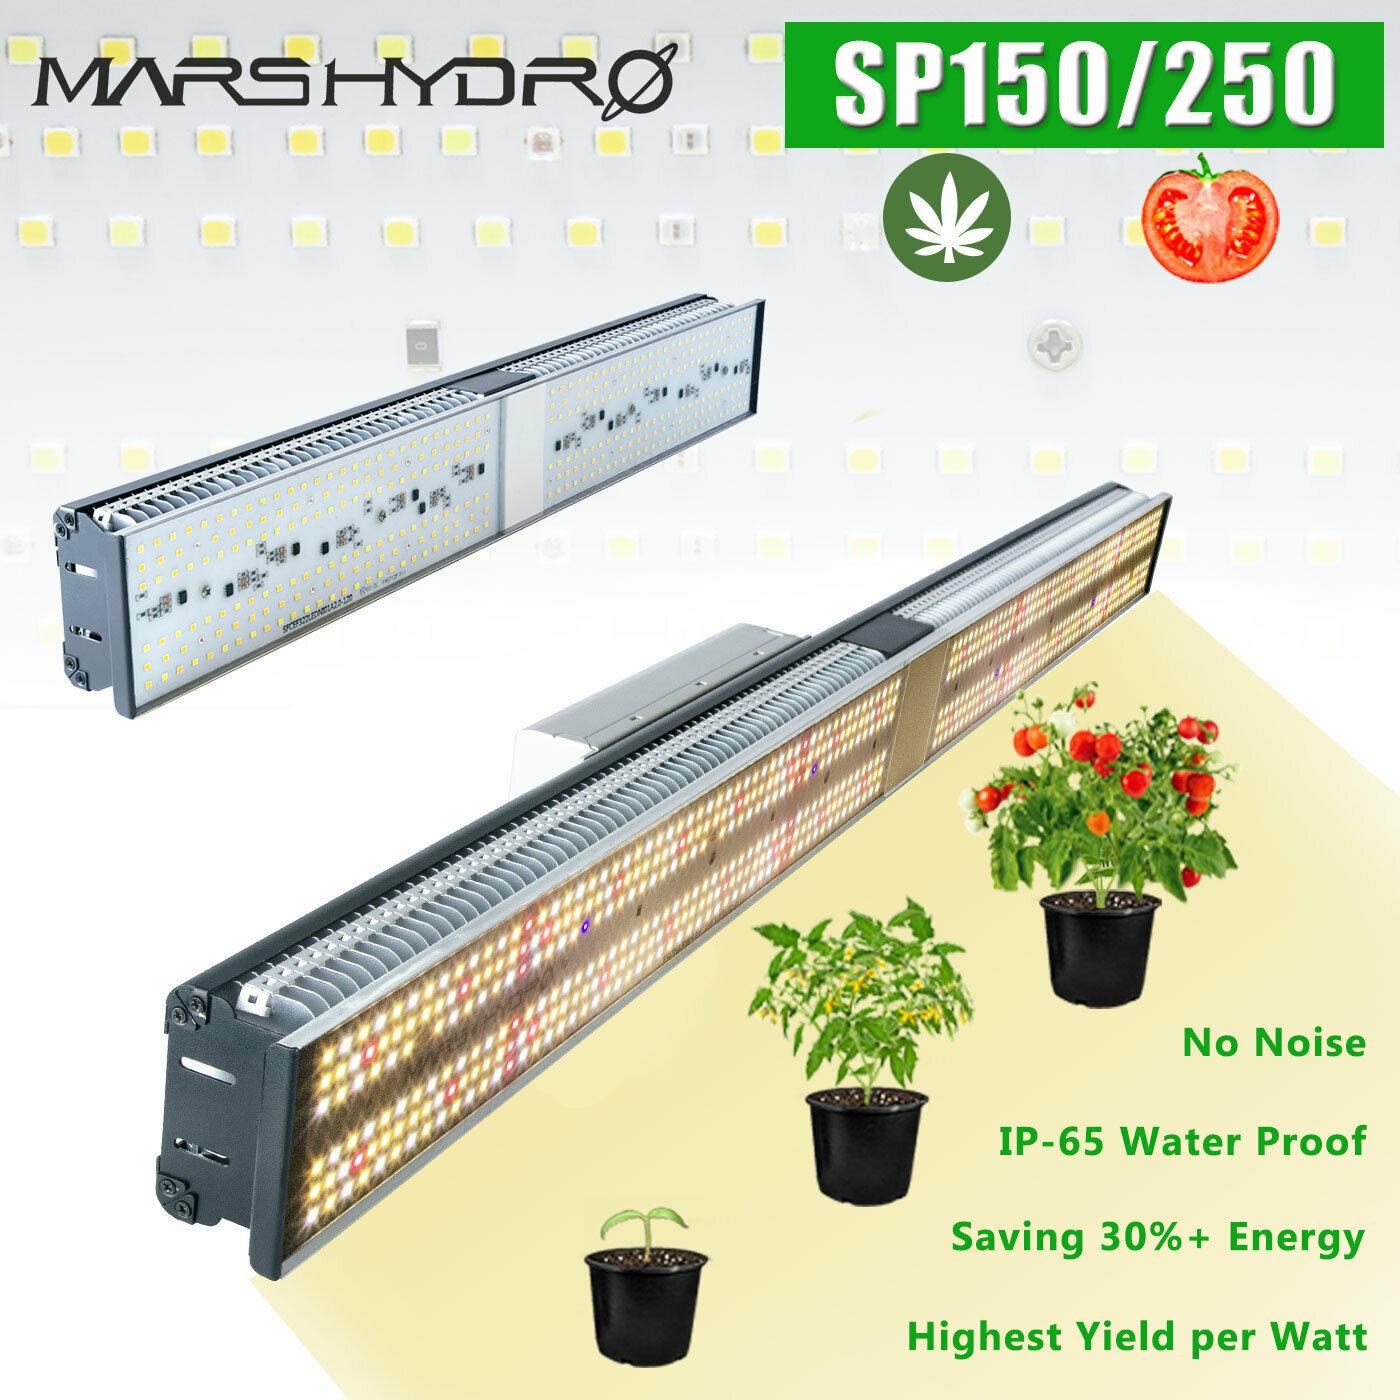 Newest Mars Hydro SP 150 250 LED Grow Light Full Spectrum Indoor Plant Veg Flower Lamp Meanwell Driver Zero Noise WaterProof